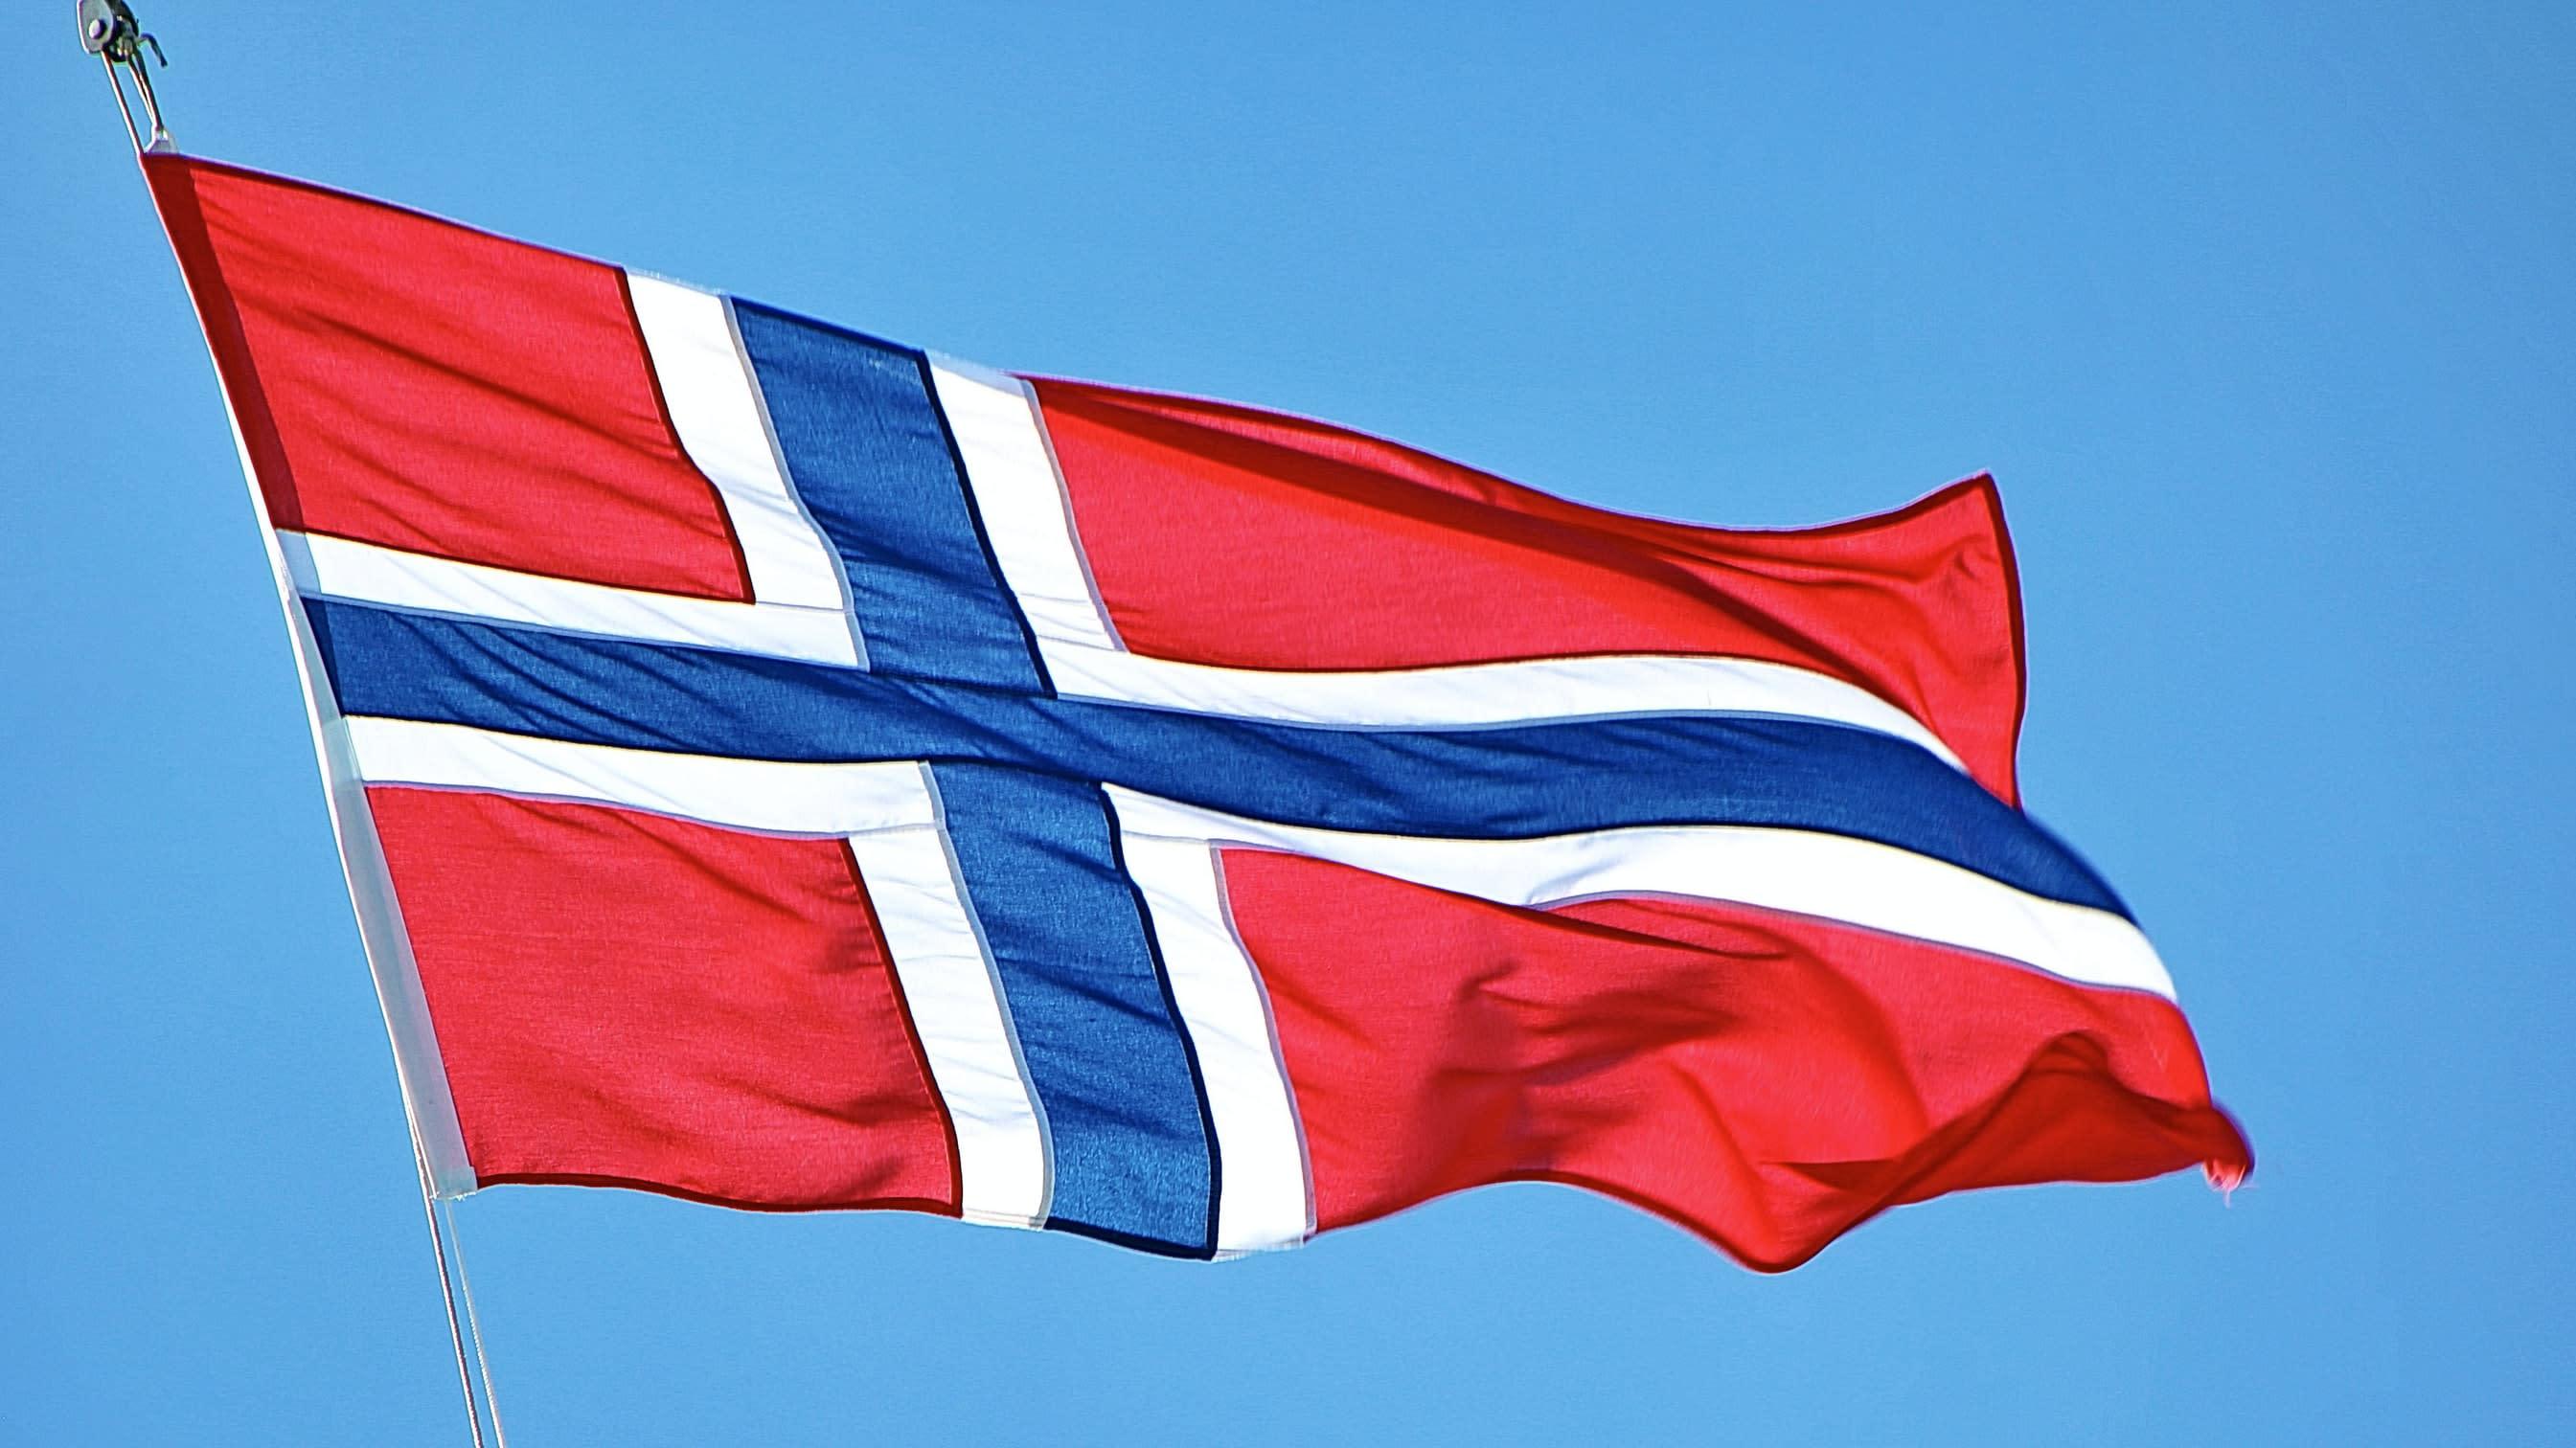 نيتيلر وسكريل يغادران مشهد القمار النرويجي